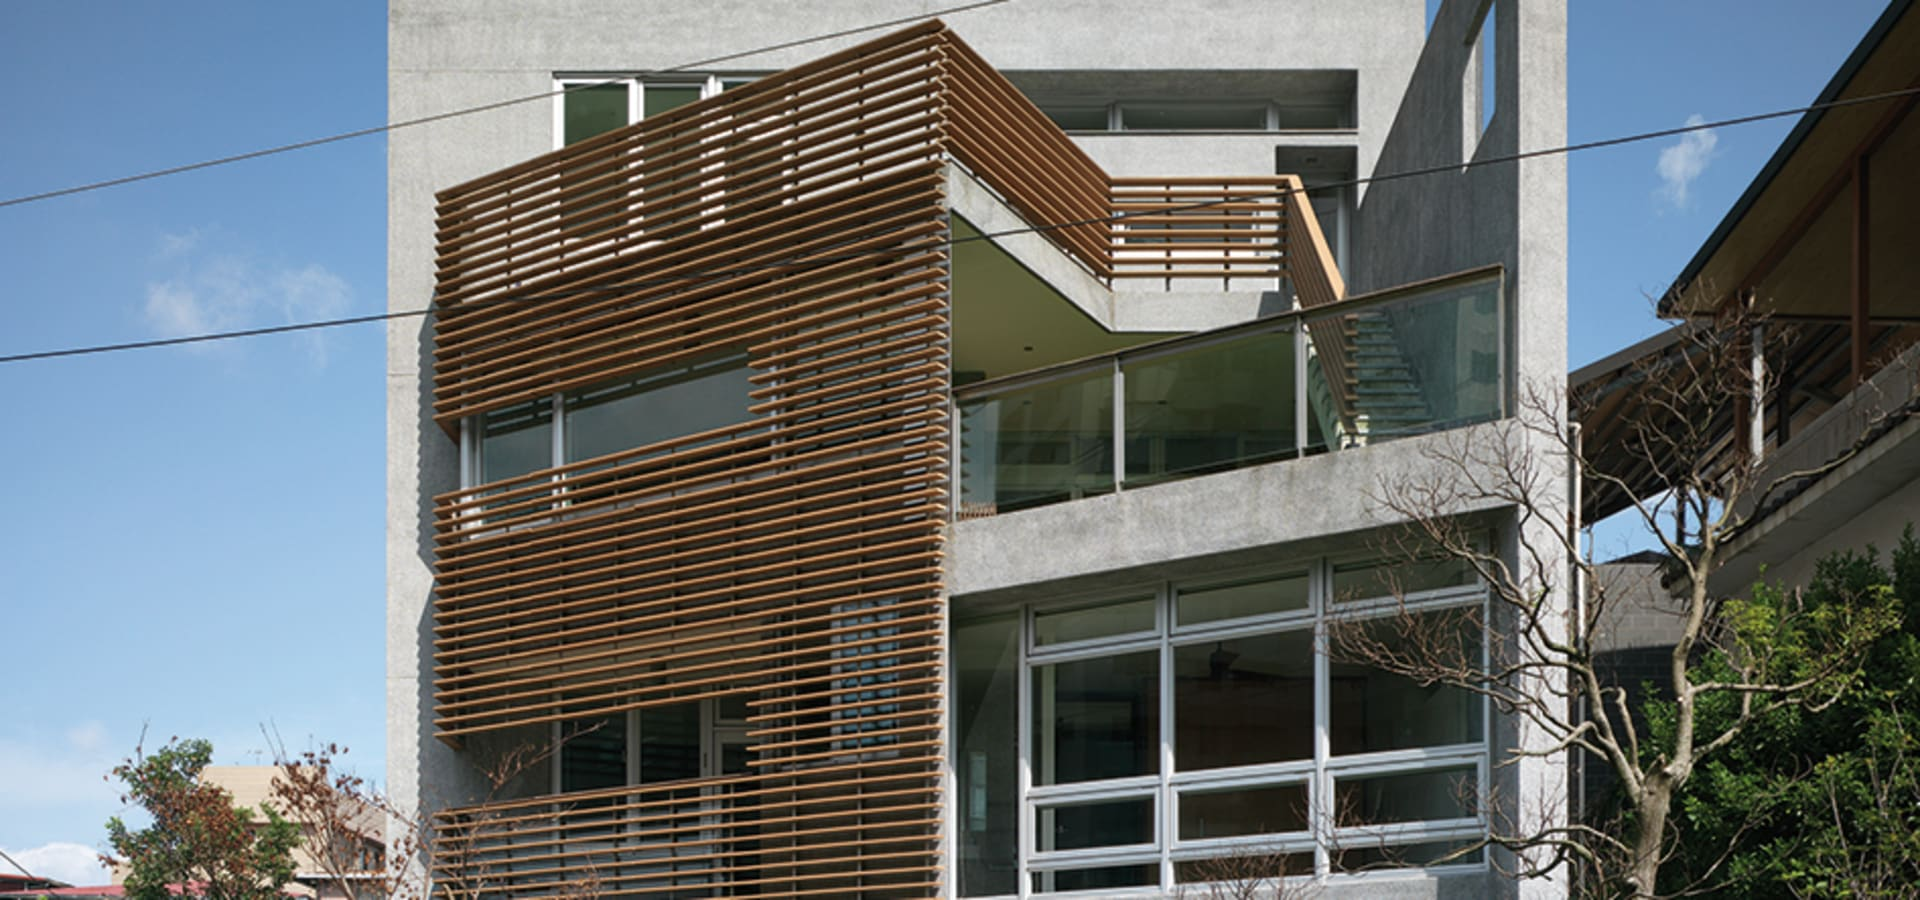 前置建築 Preposition Architecture